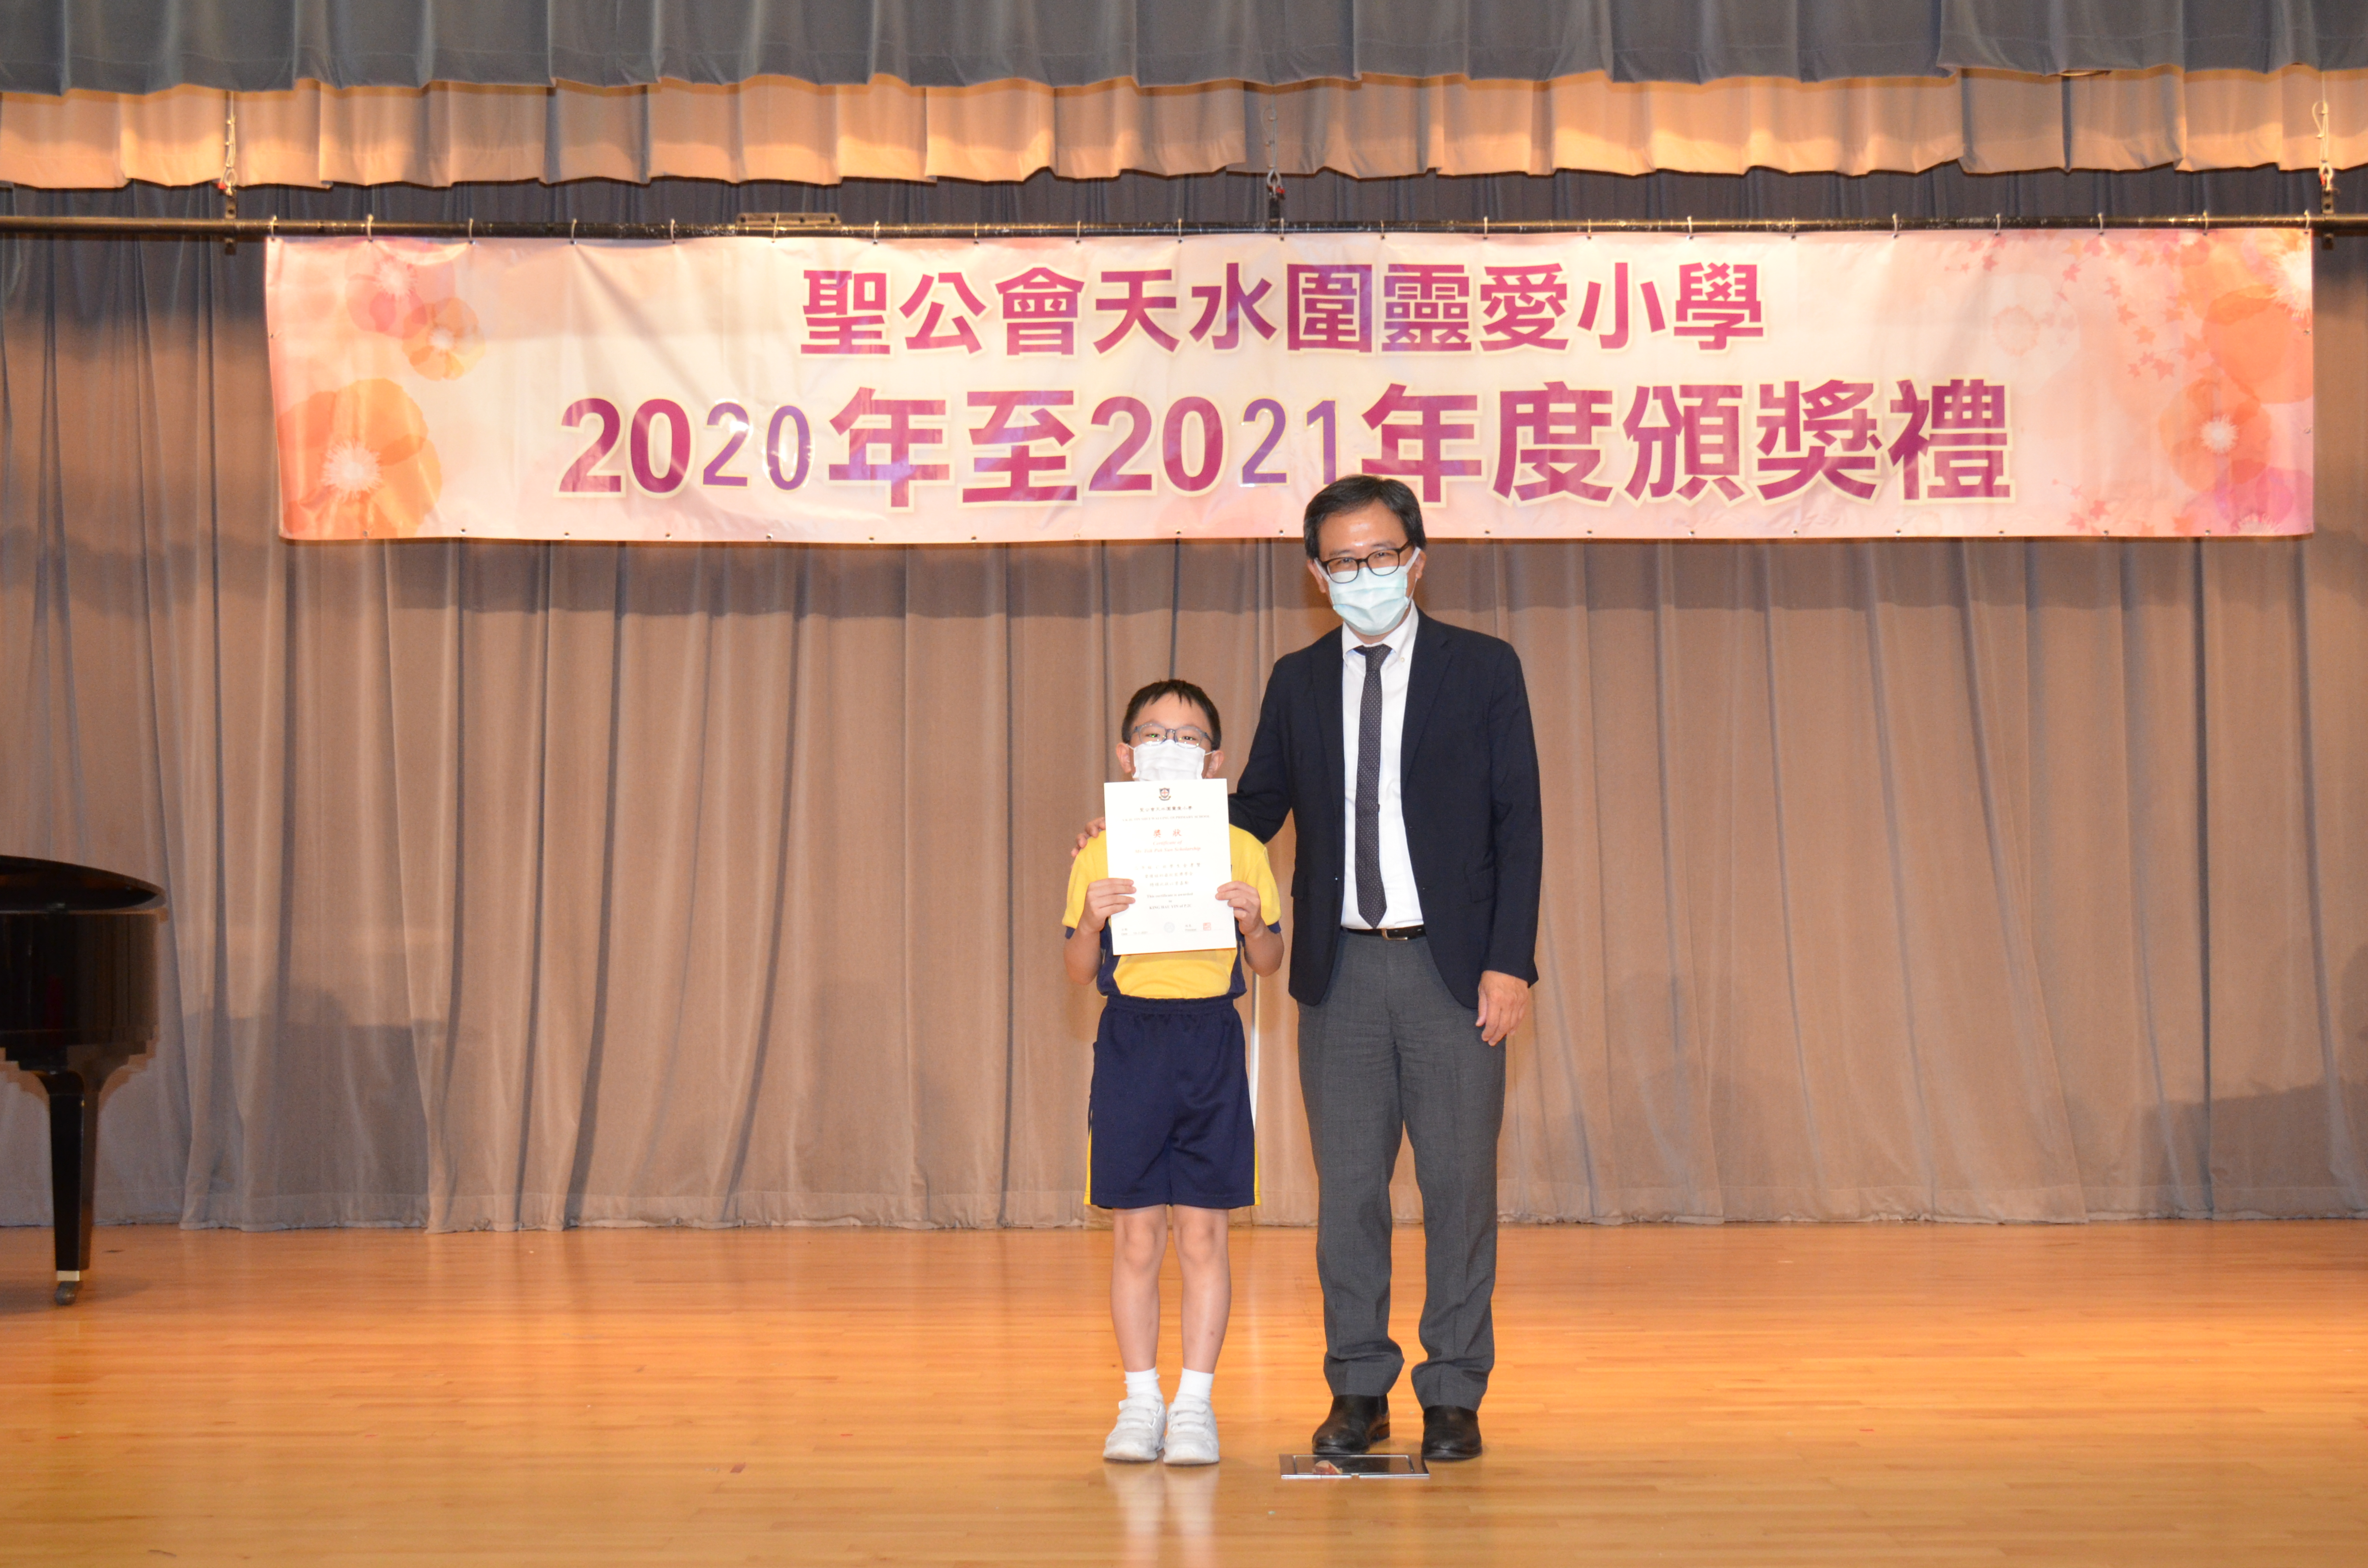 https://skhtswlo.edu.hk/sites/default/files/dsc_3476_1.jpg